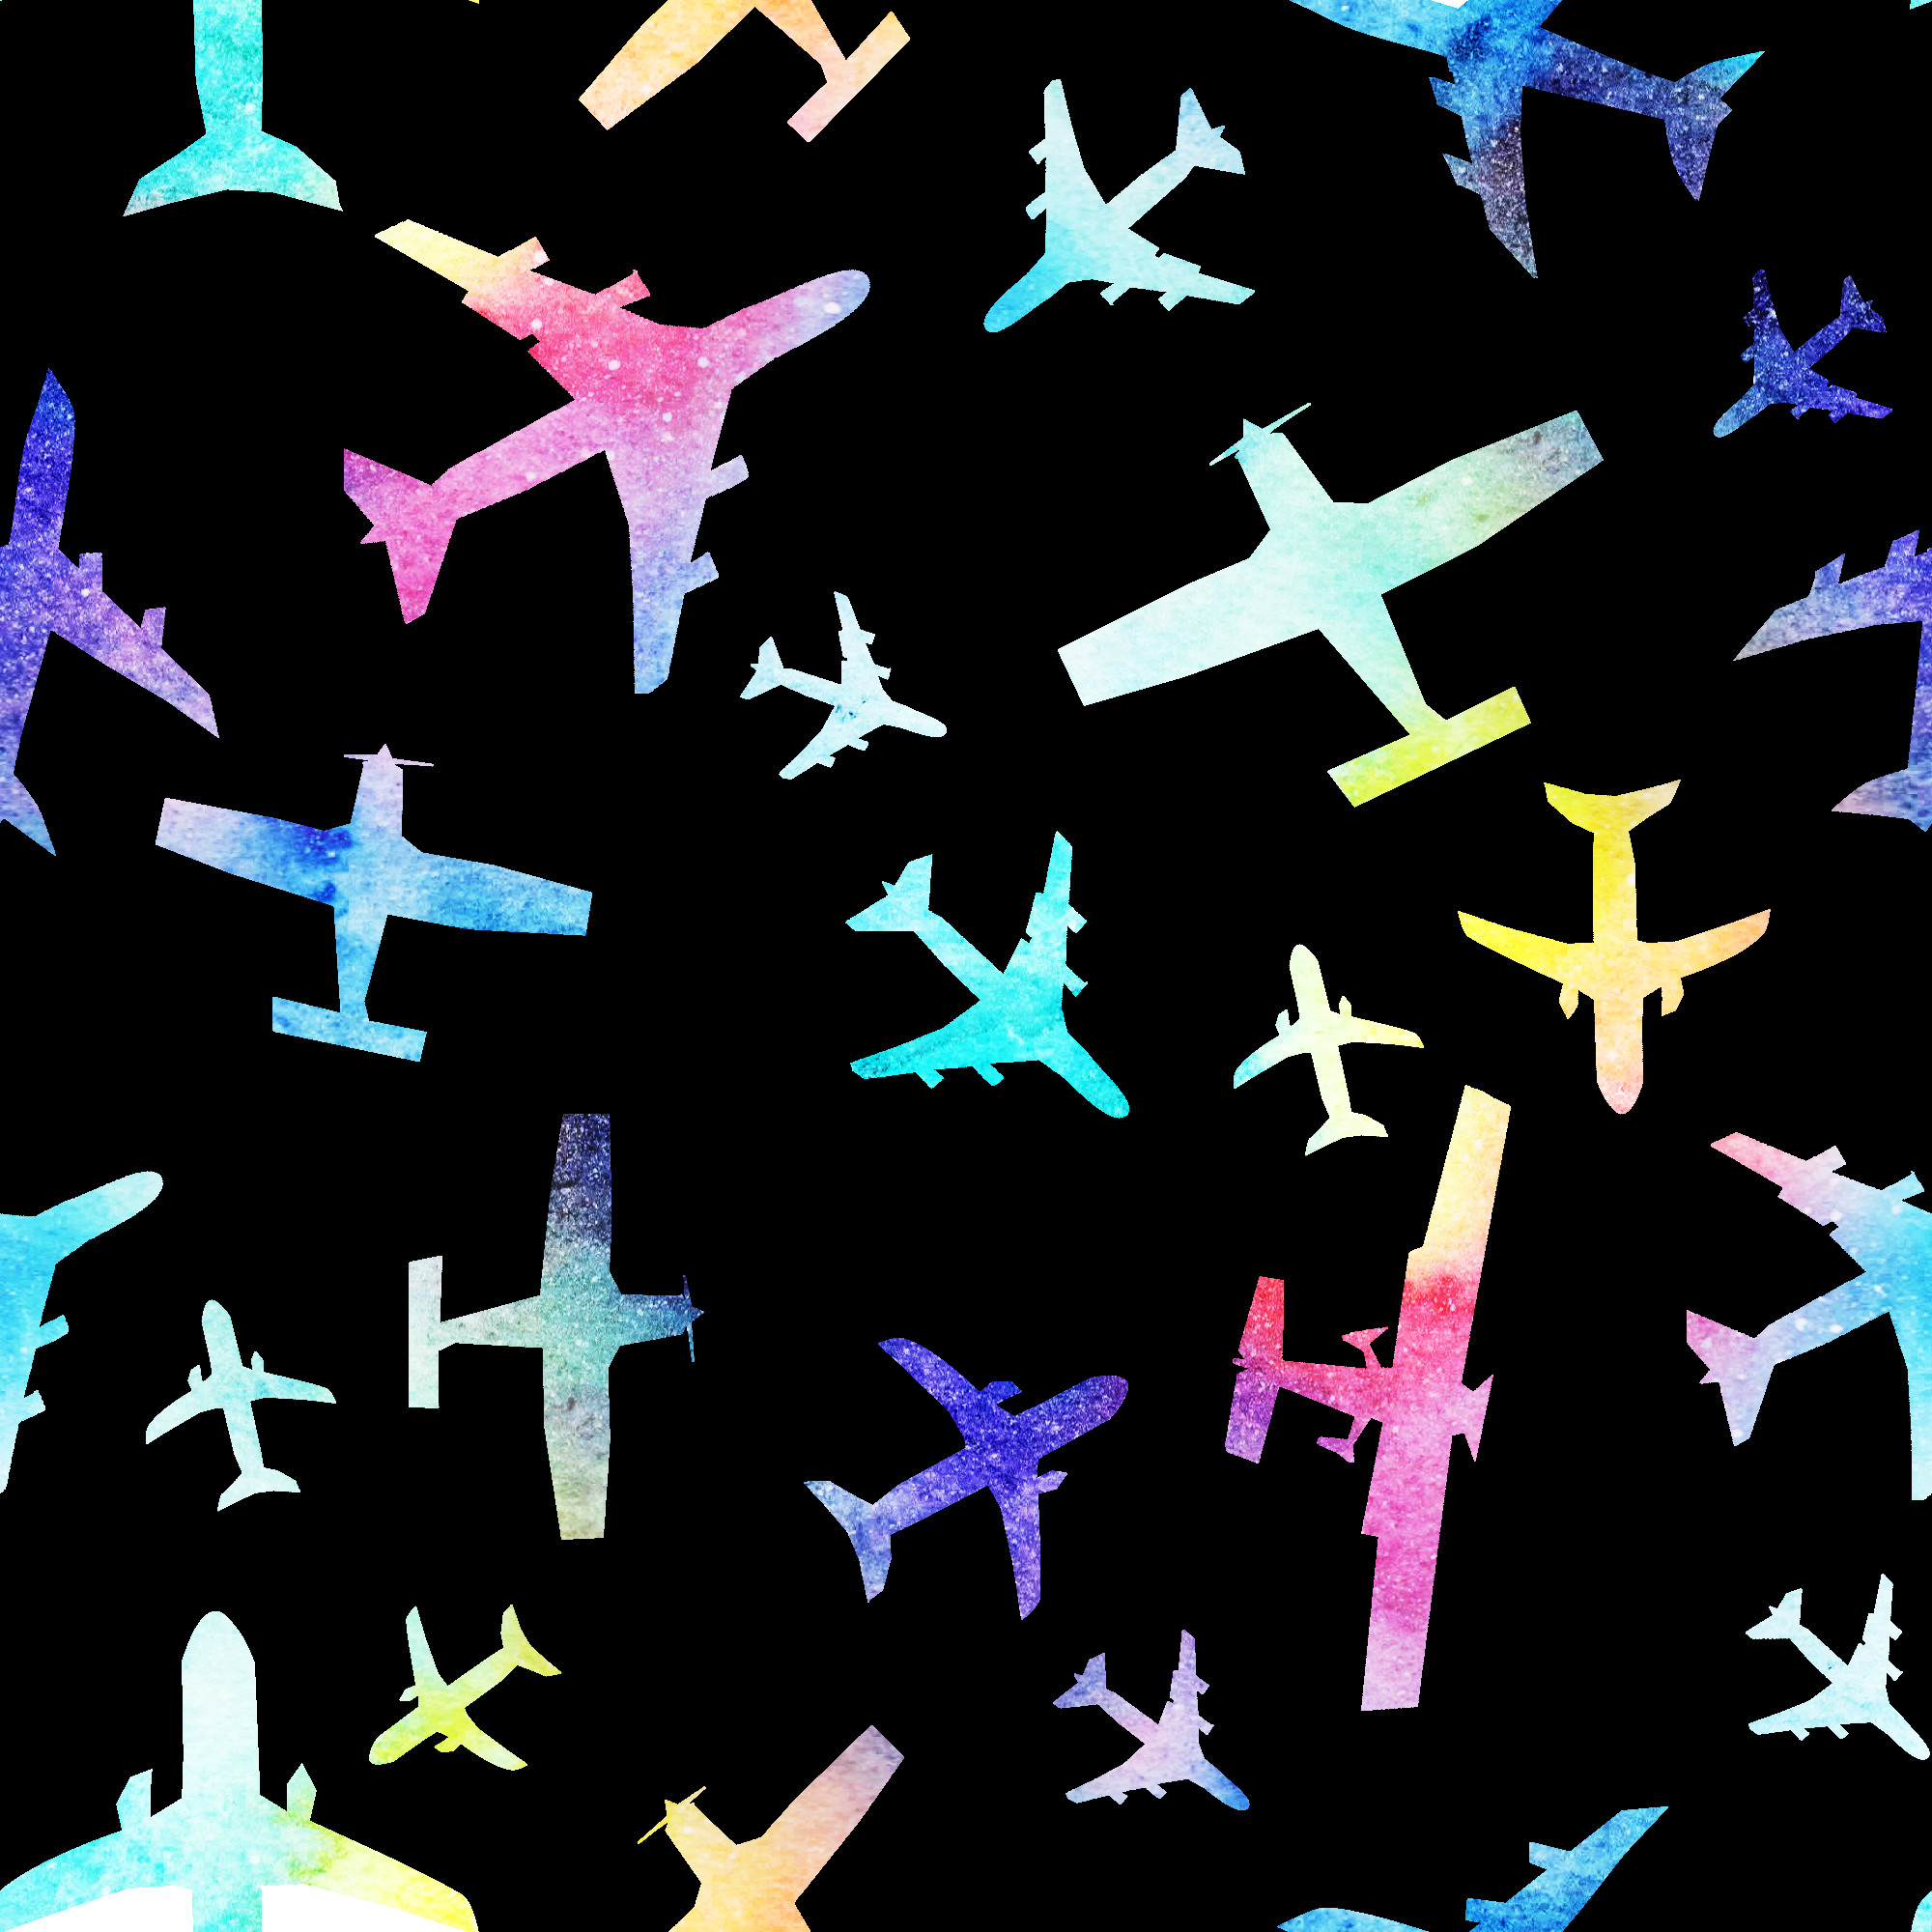 6861463_rrainbow_planes_black.jpg